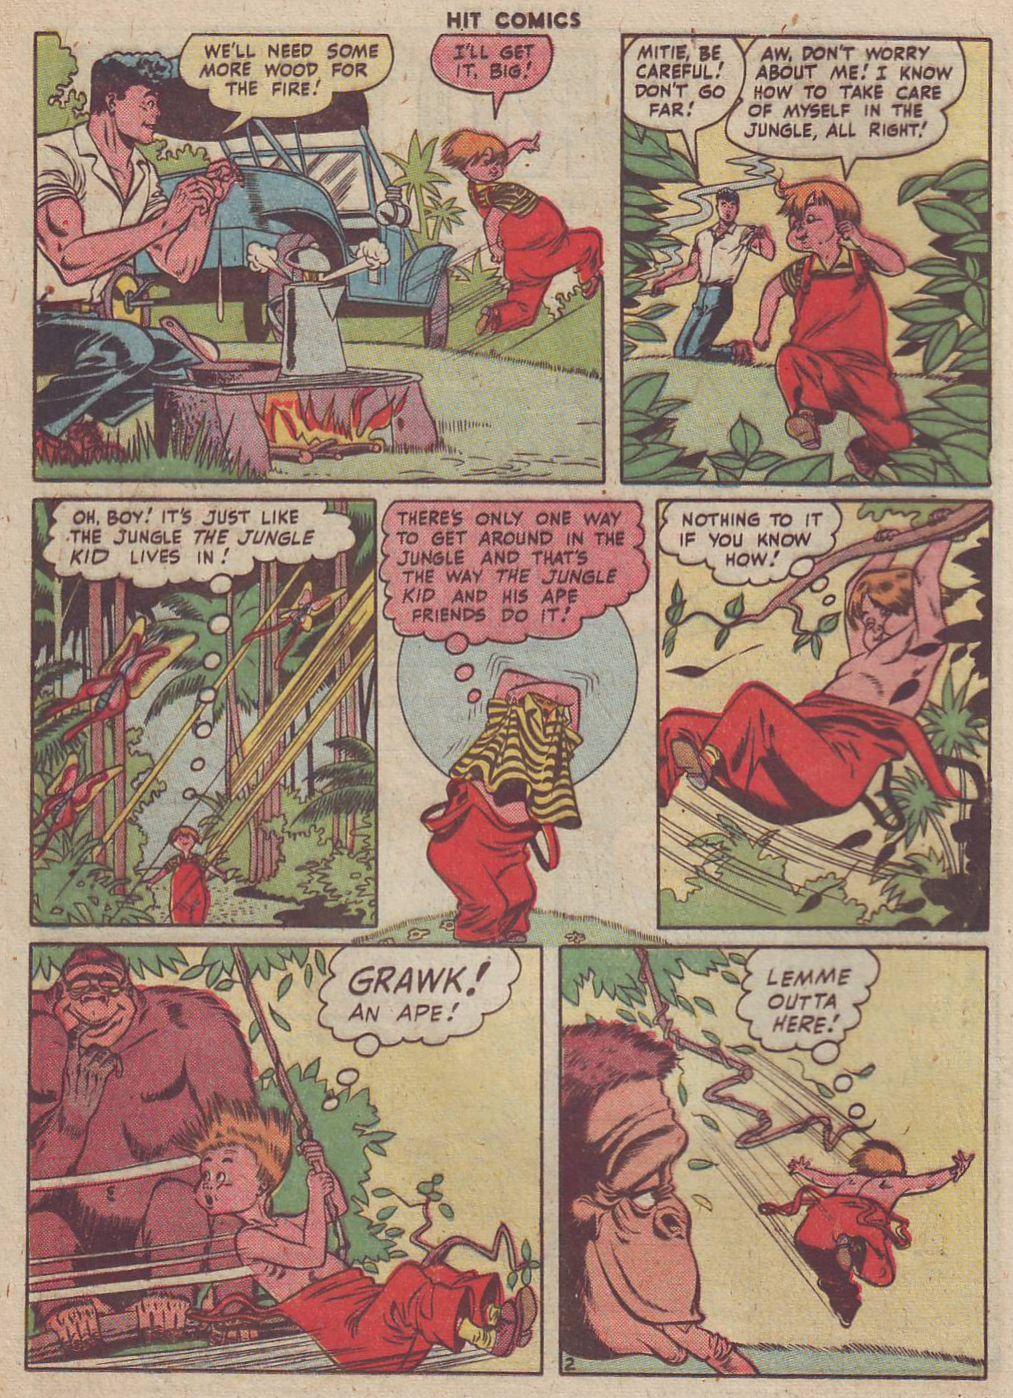 Read online Hit Comics comic -  Issue #51 - 22